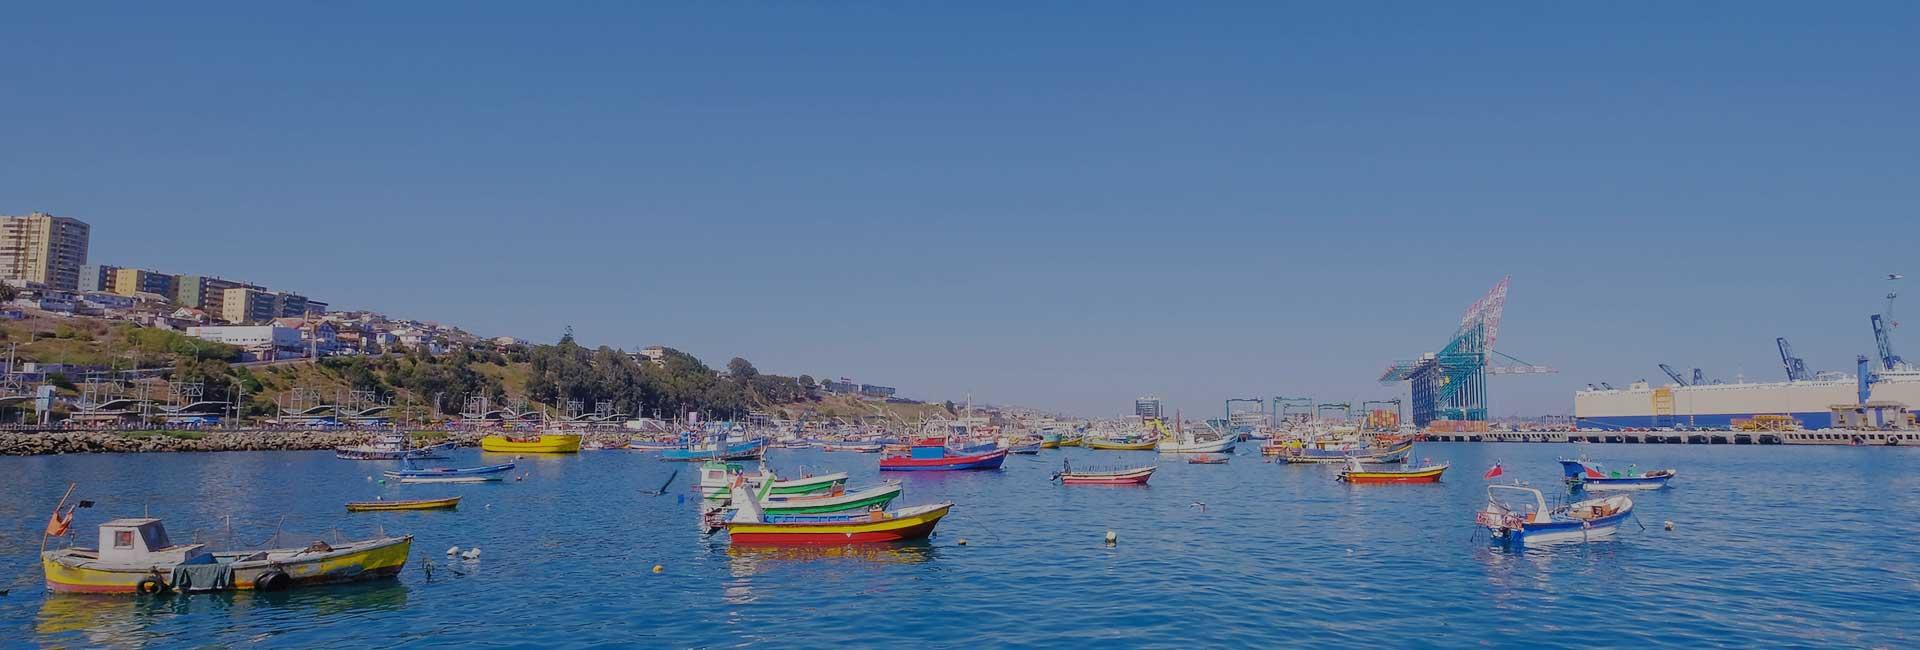 San Antonio Port Chile Transport